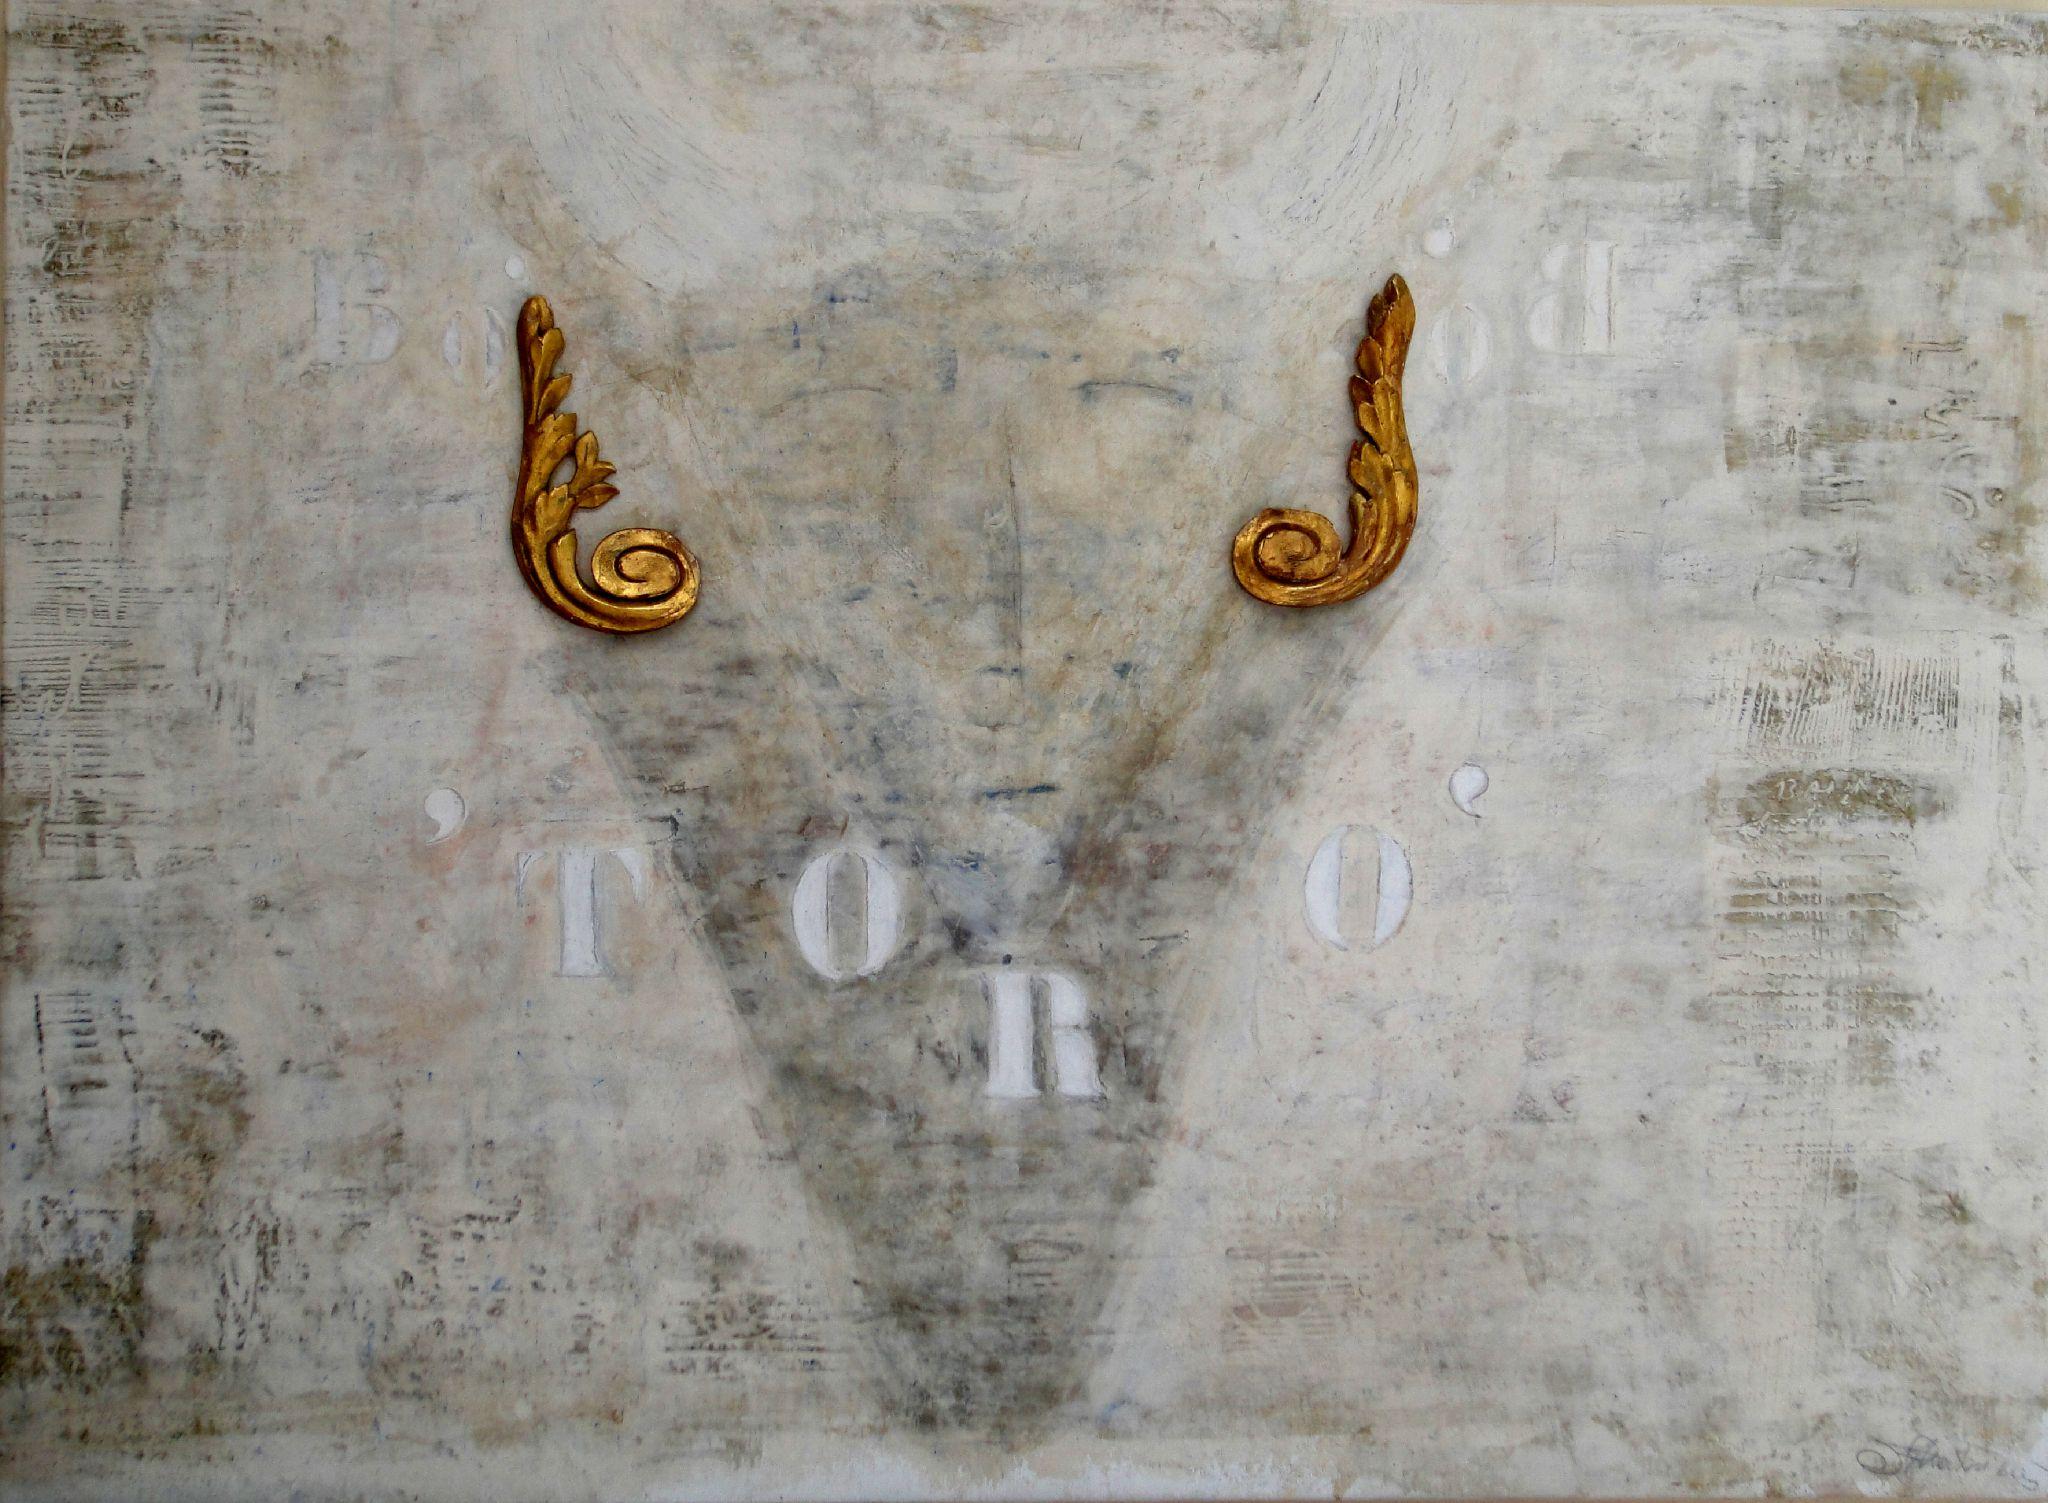 Toro D'ORO'1